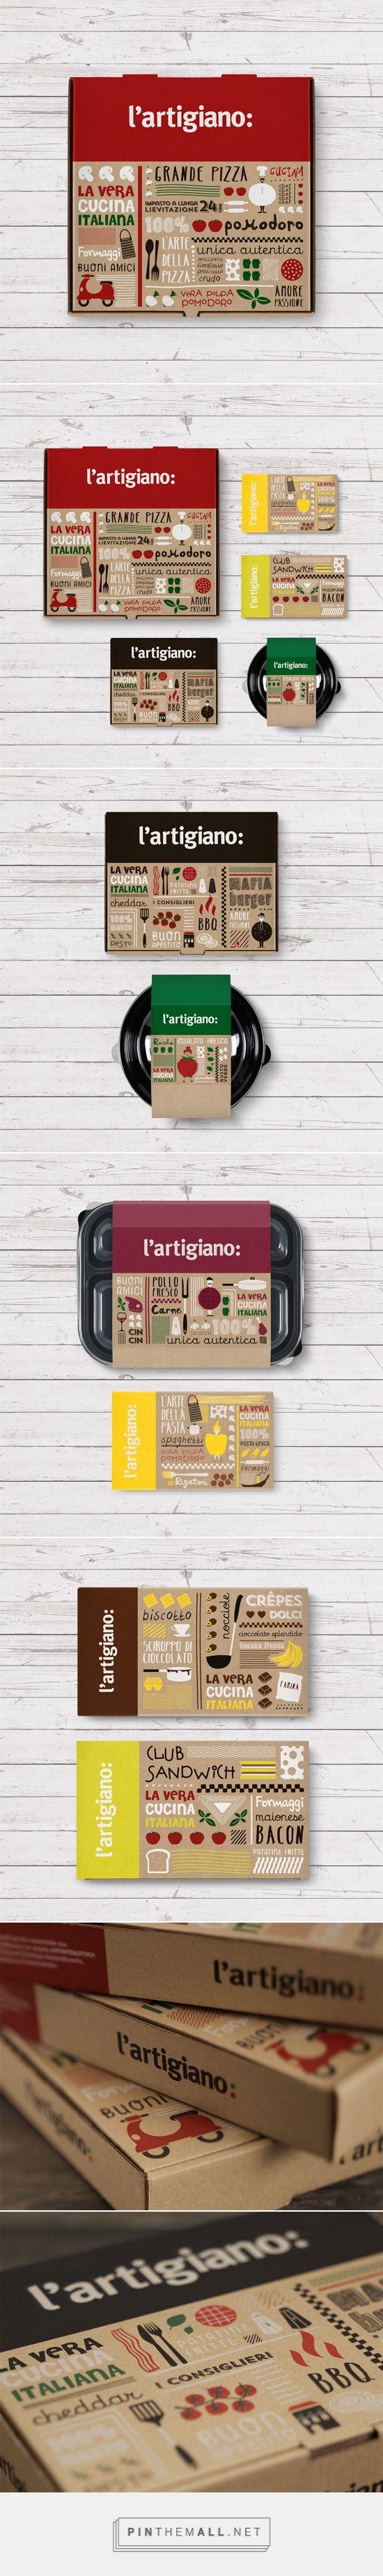 L'Artigiano is a chain of Italian food delivery restaurants.